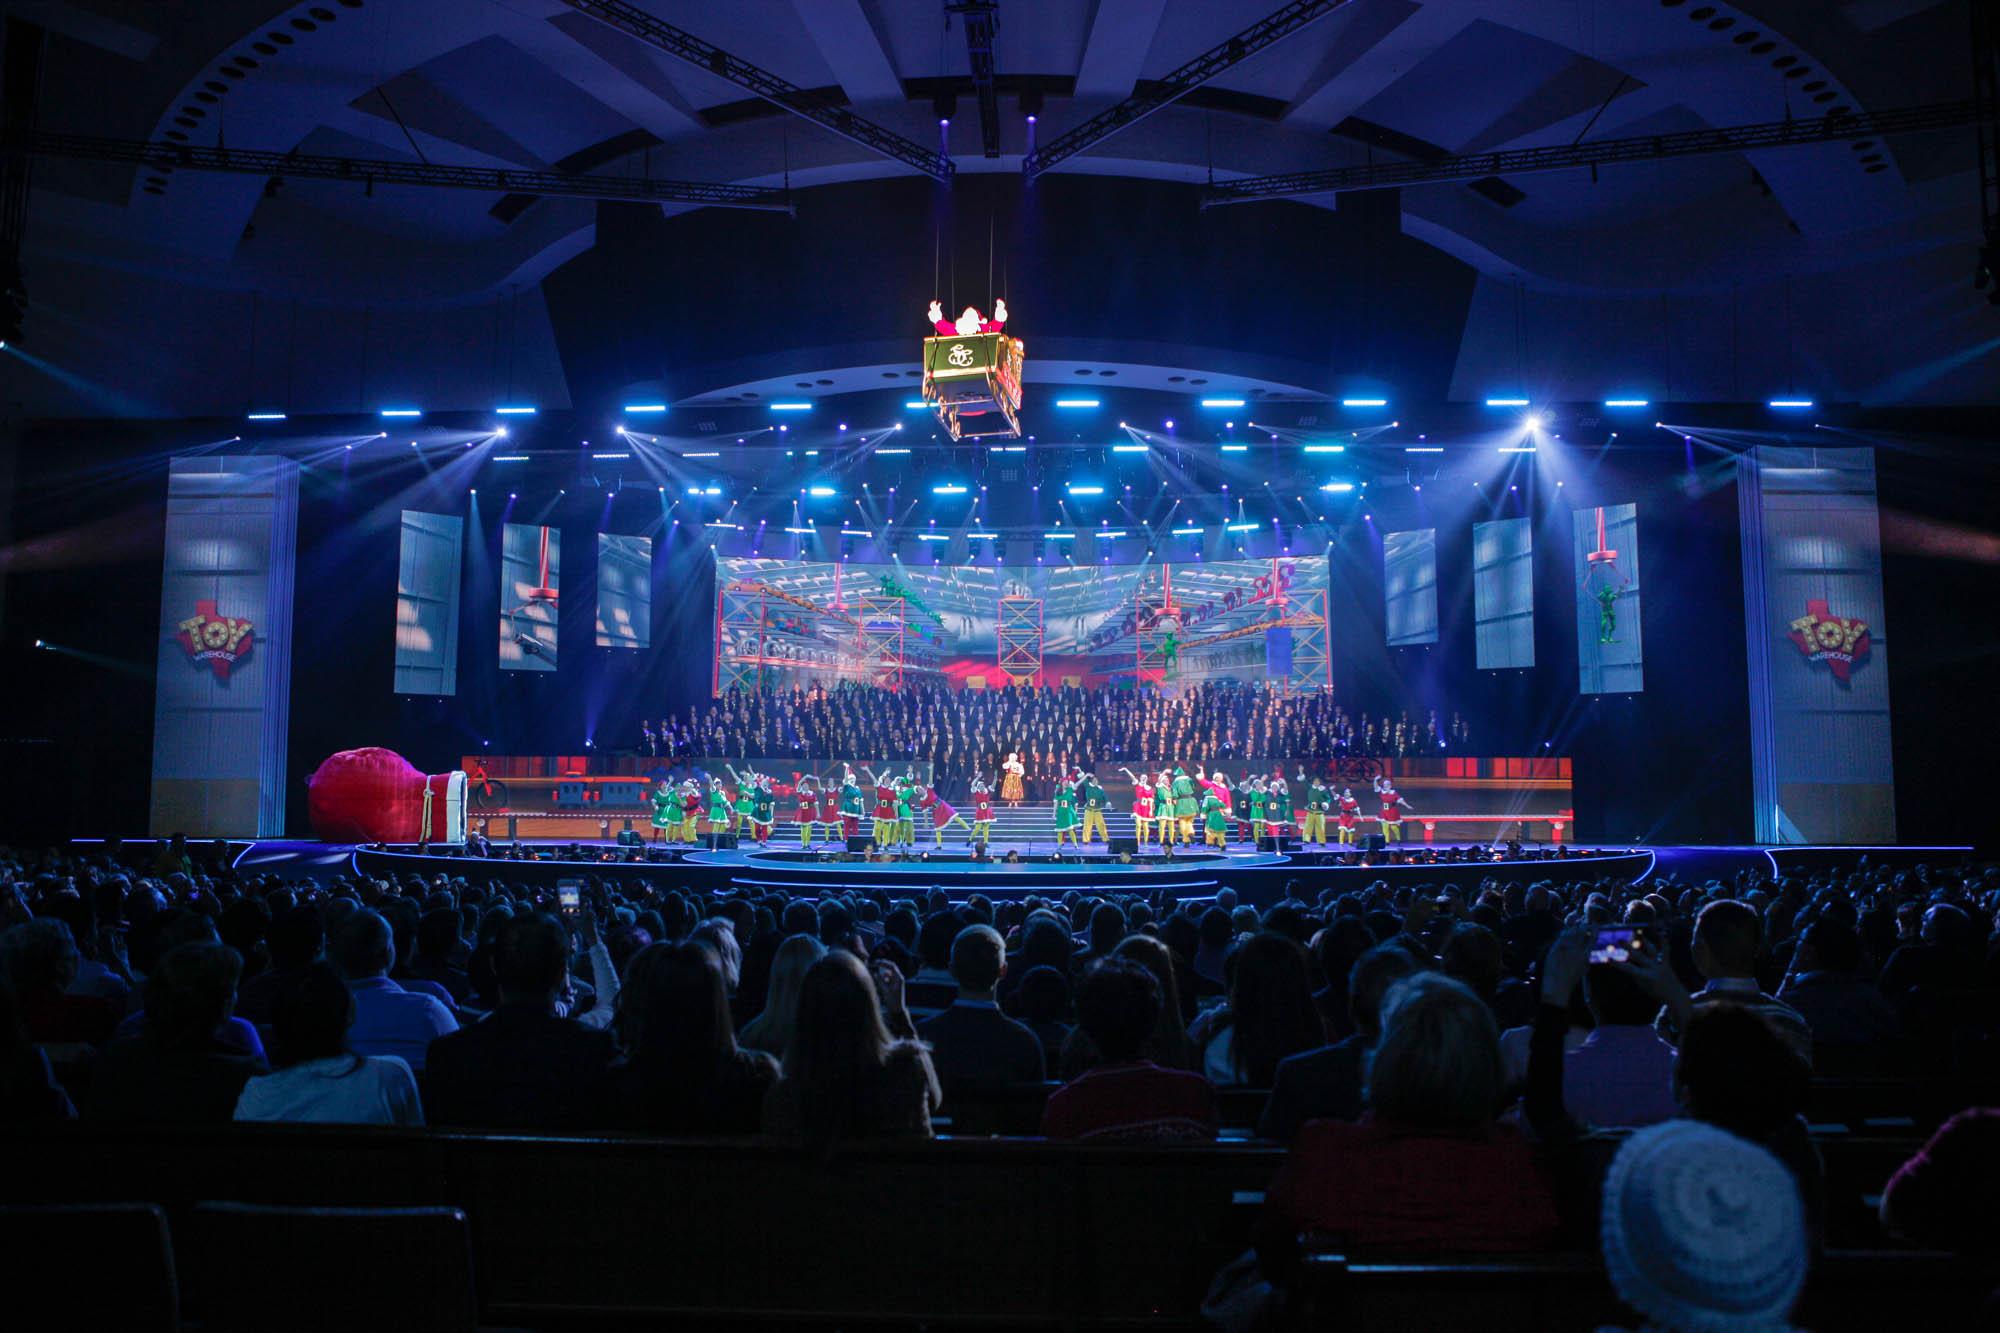 Prestonwood Christmas Show.The Gift Of Christmas Uvld